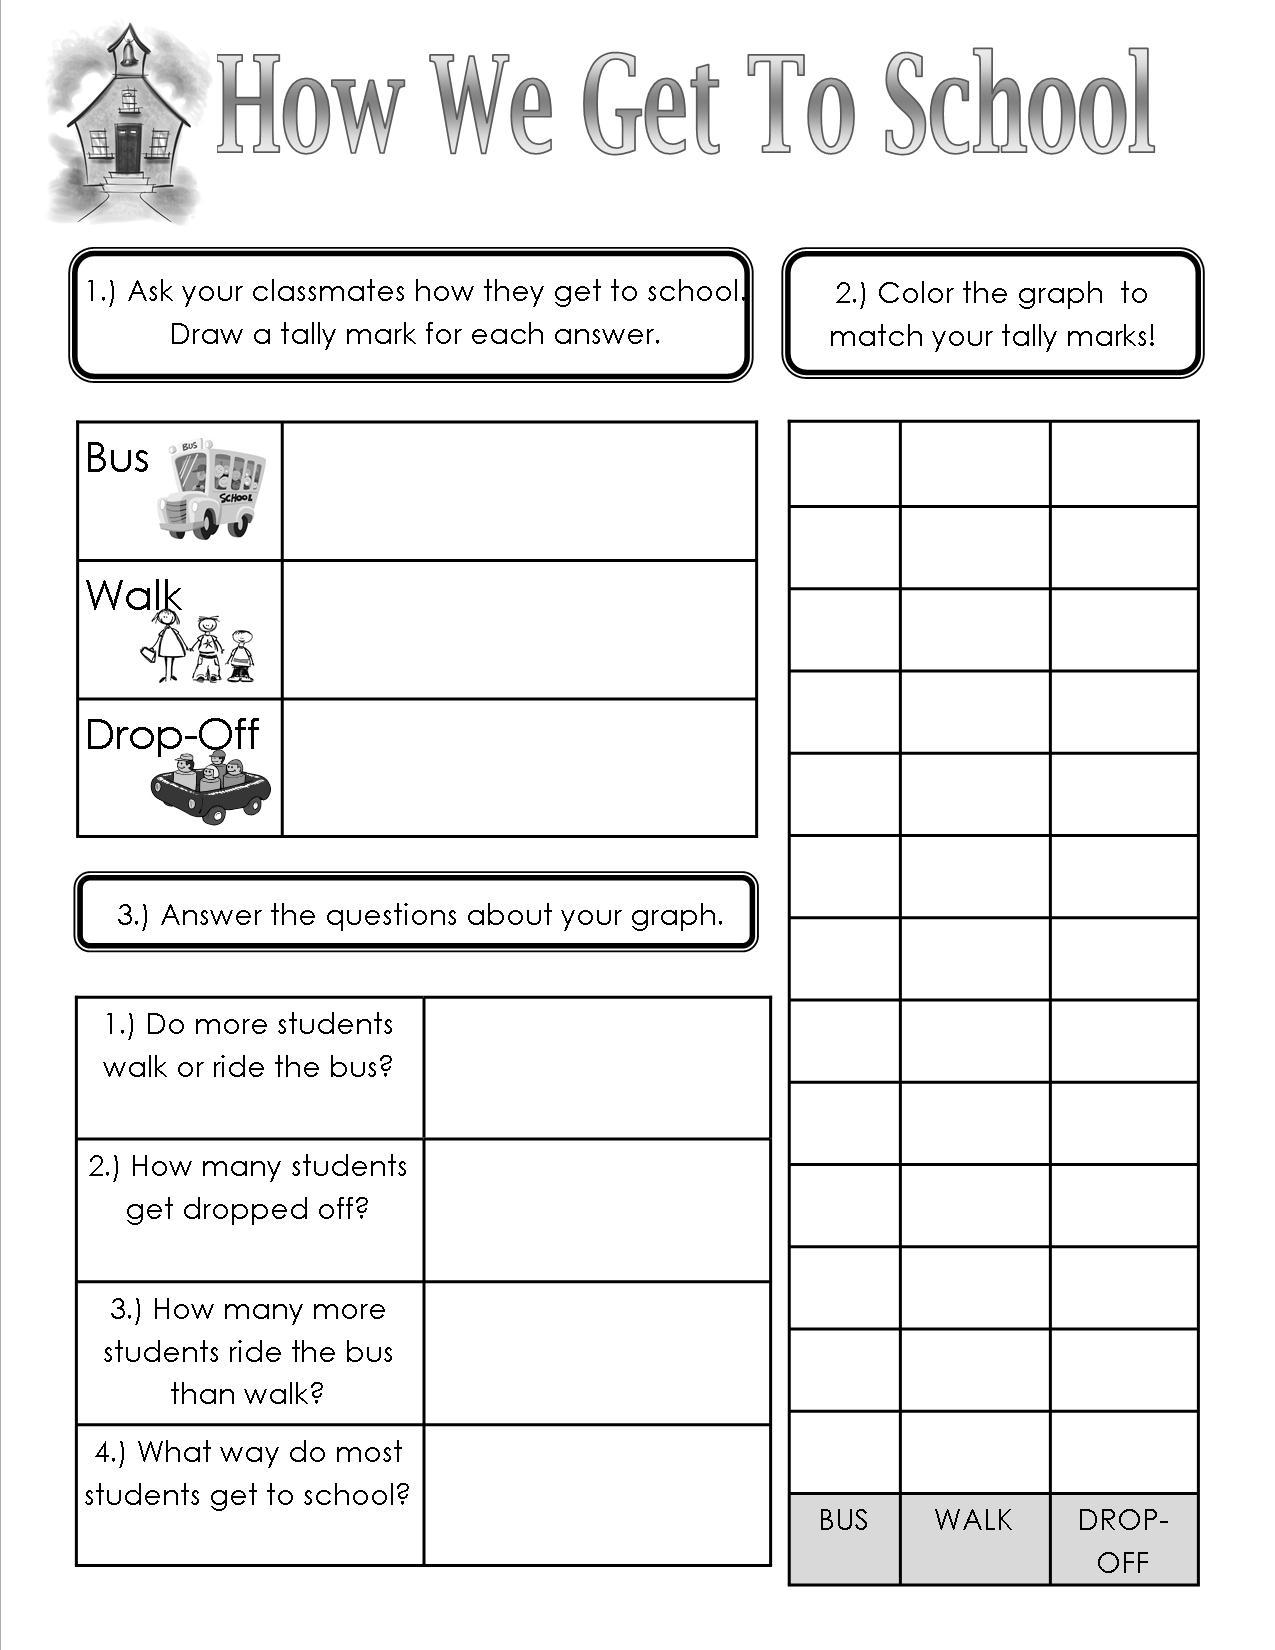 How We Get To School Sheet Teaching Heart Blog